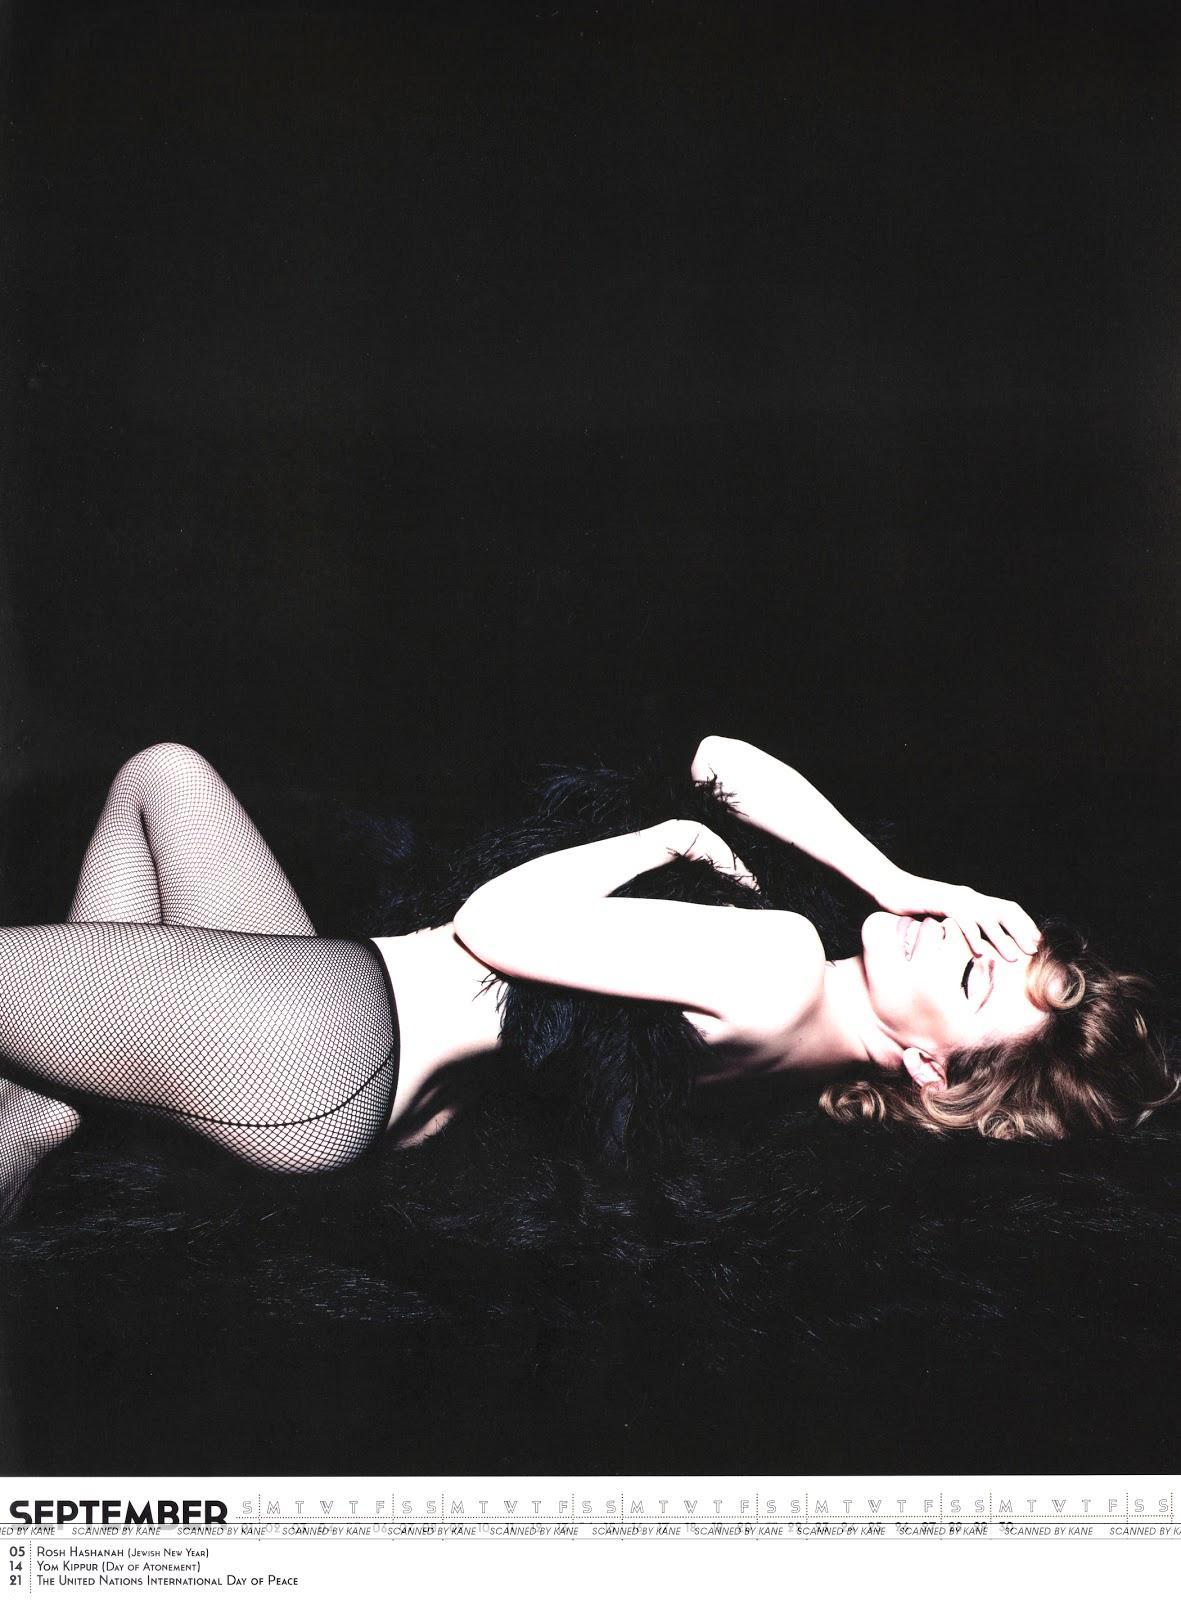 http://3.bp.blogspot.com/-L0xtHJsfu_I/UHwBvCJBNnI/AAAAAAAATTw/5UL2uUs3gpE/s1600/Kylie+Minogue+-+Official+2013+Calendar+-10.jpg